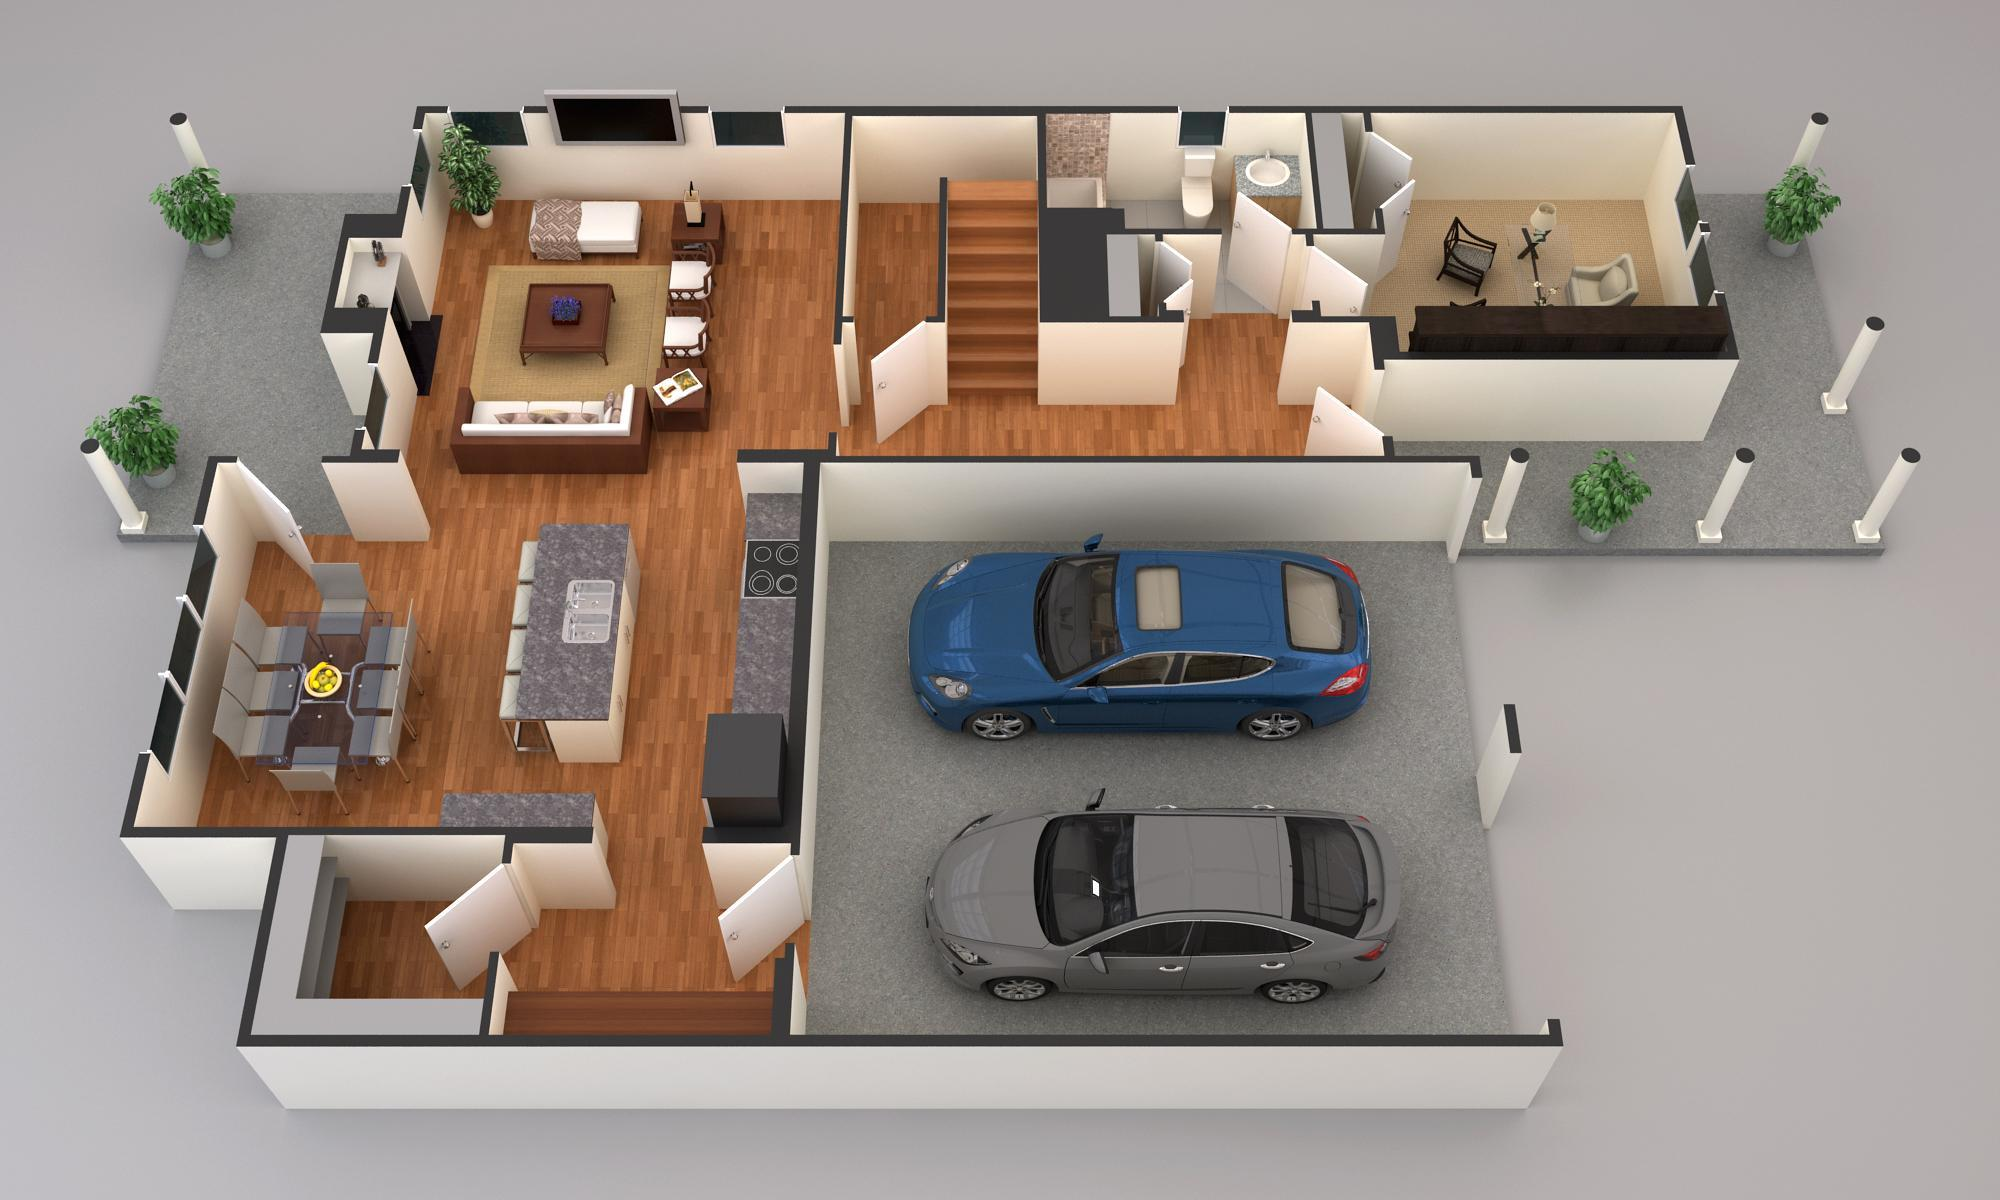 http://partners-dynamic.bdxcdn.com/Images/Homes/GoodallHomebuilder/max1500_36037077-190710.jpg